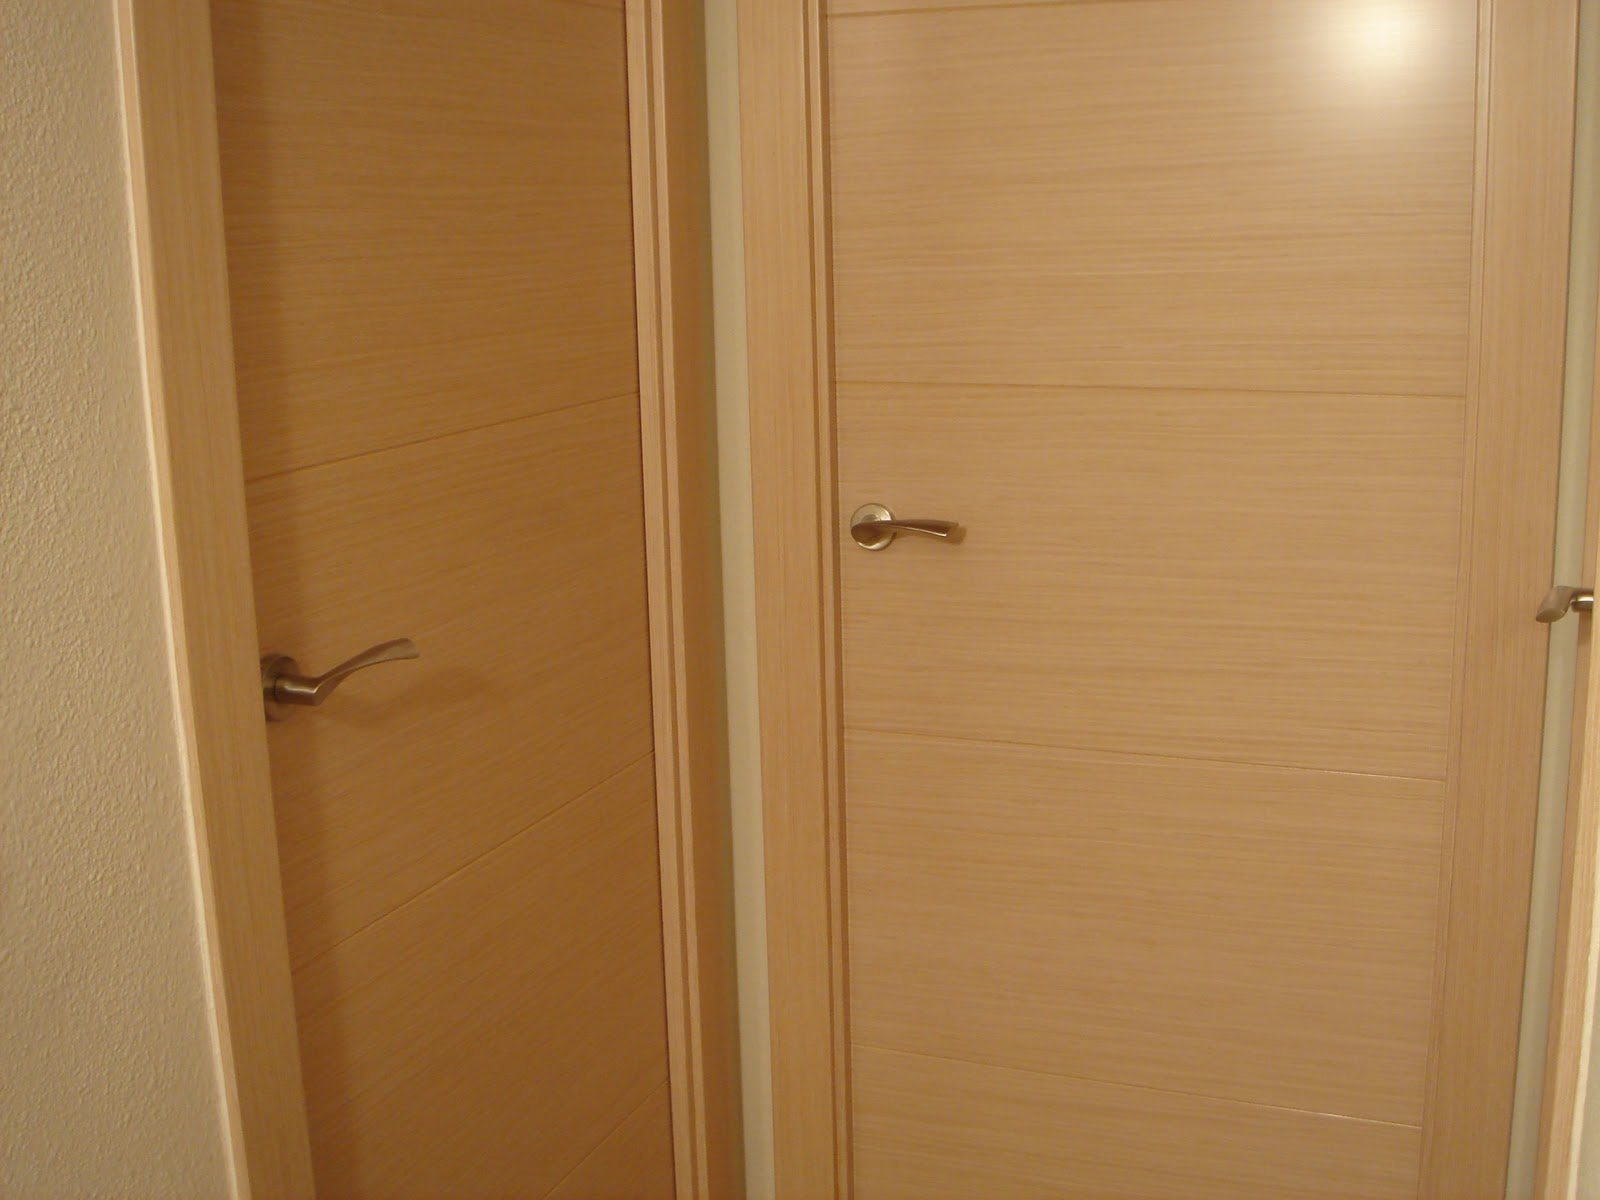 Unifa disseny puertas roble decape - Puerta de roble ...